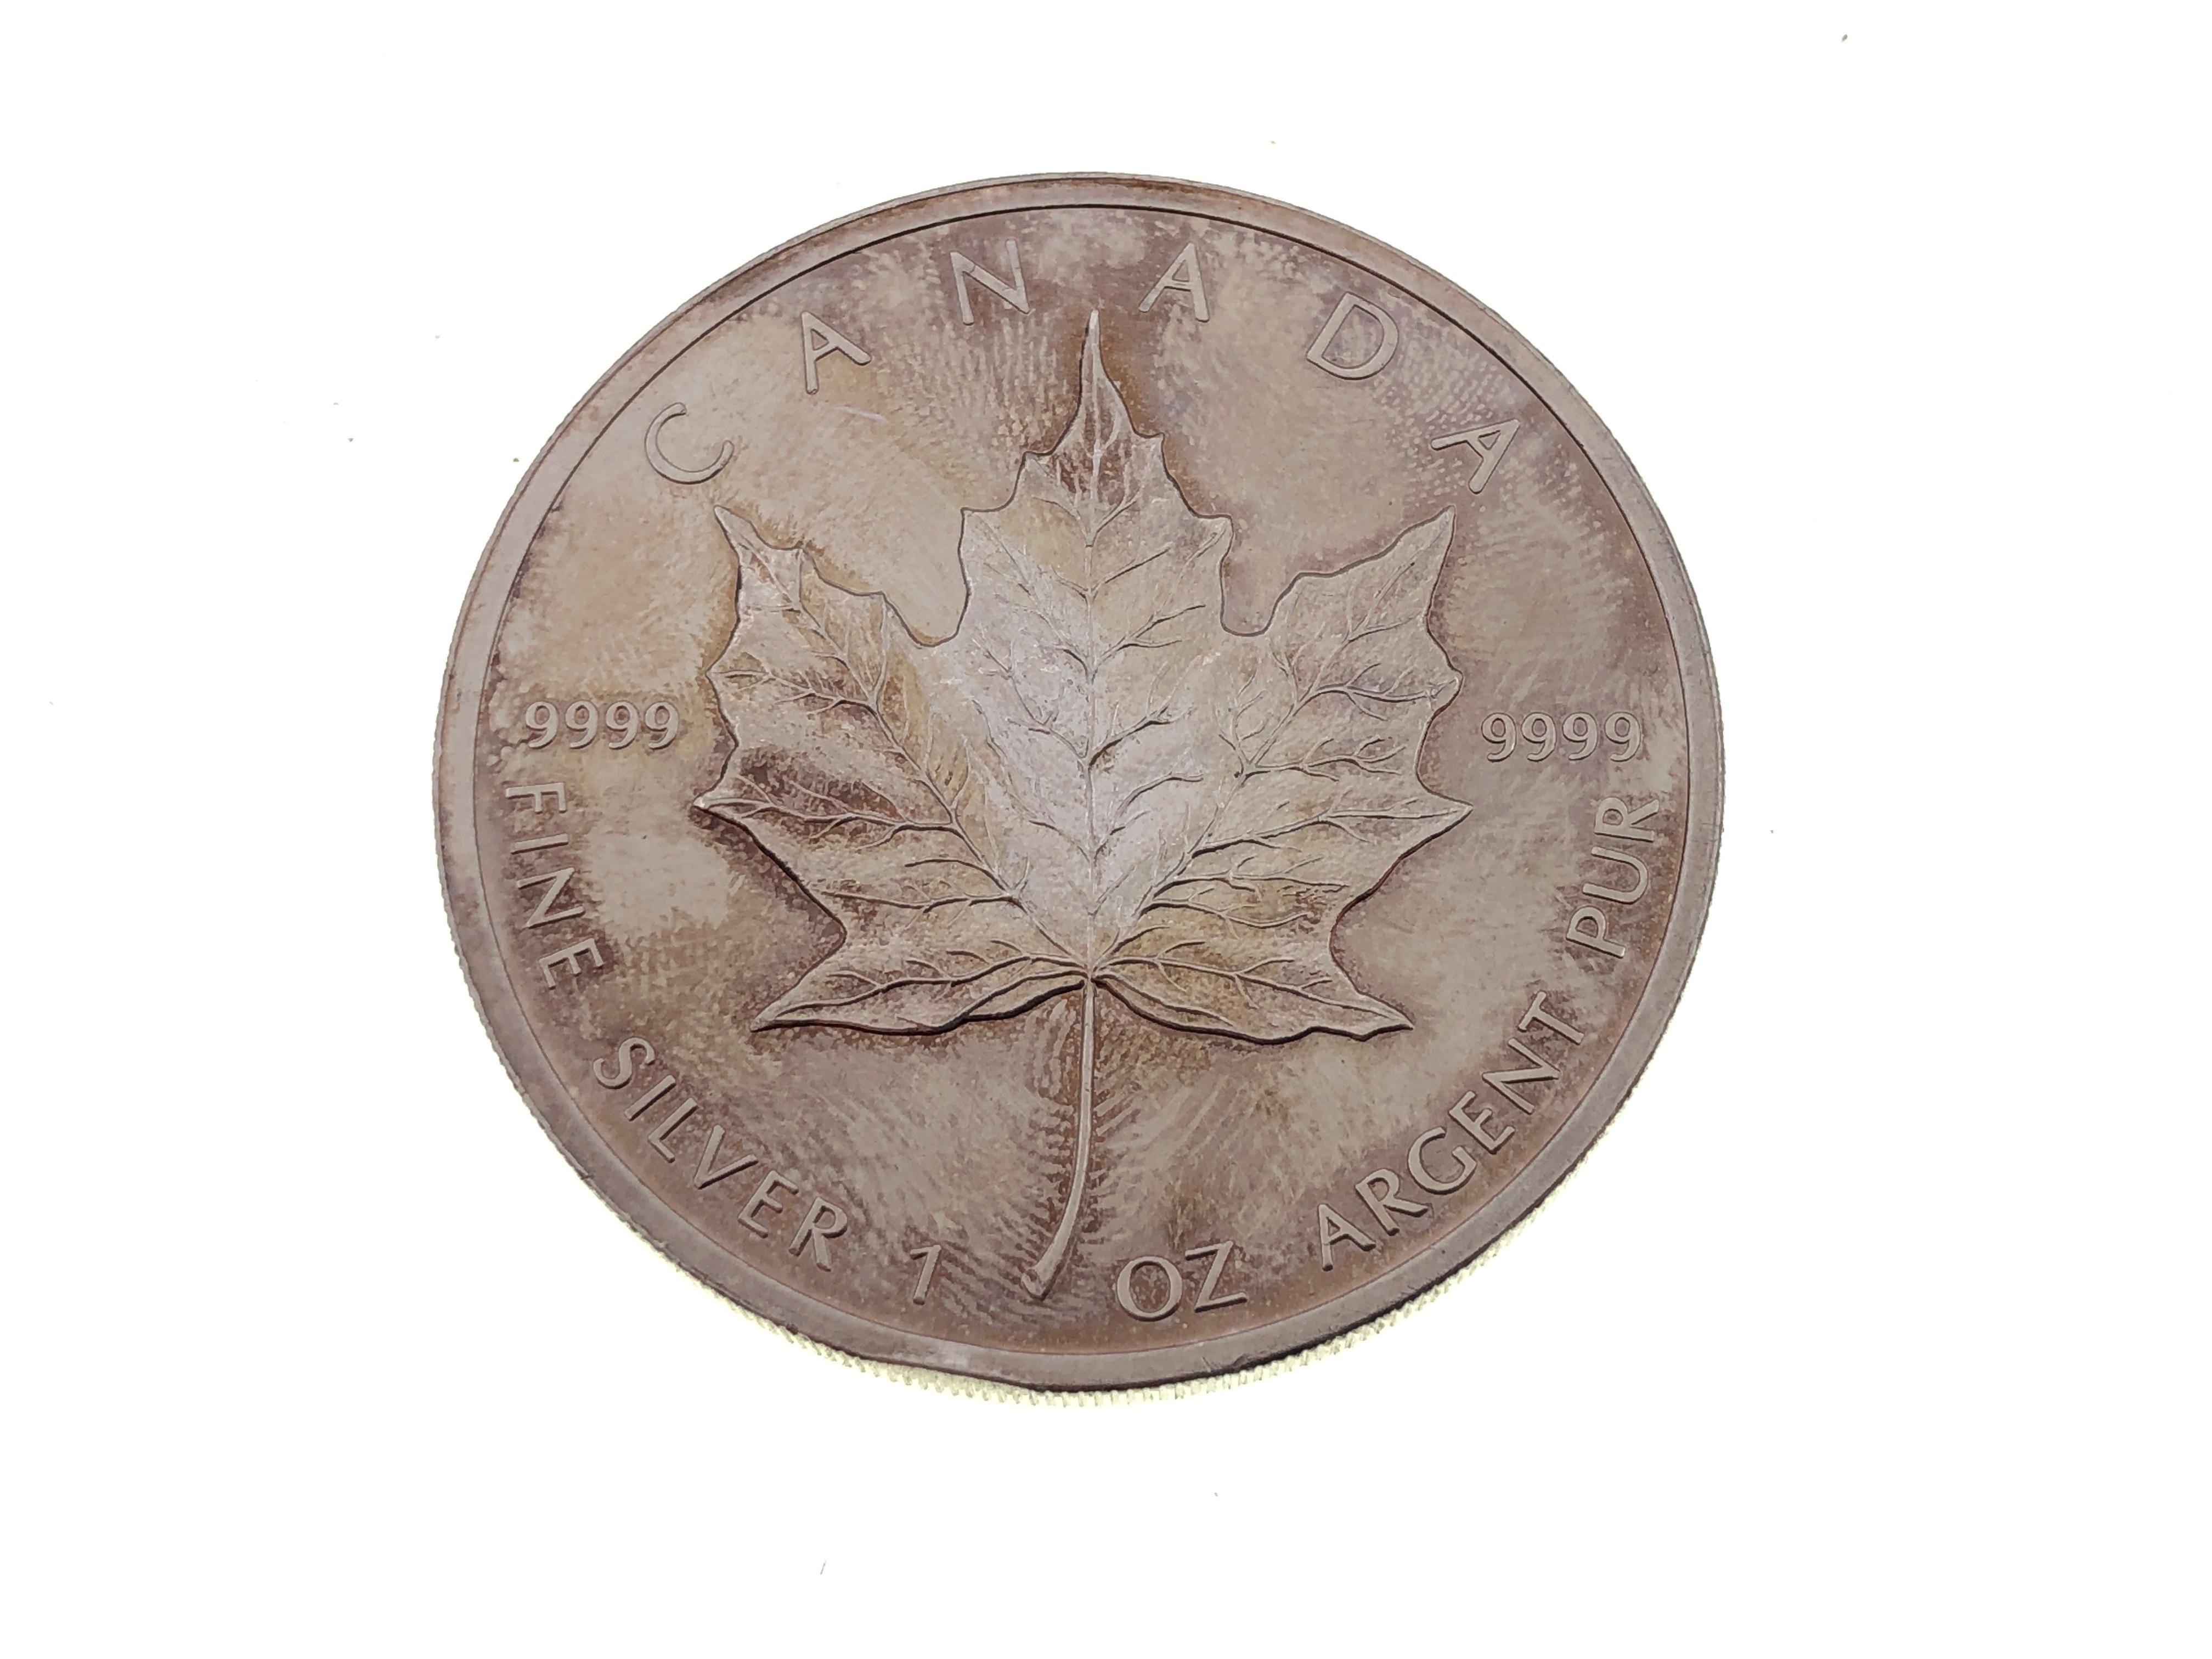 2011 $5 Canadian Maple Leaf 1 oz .9999 Fine Silver Coin